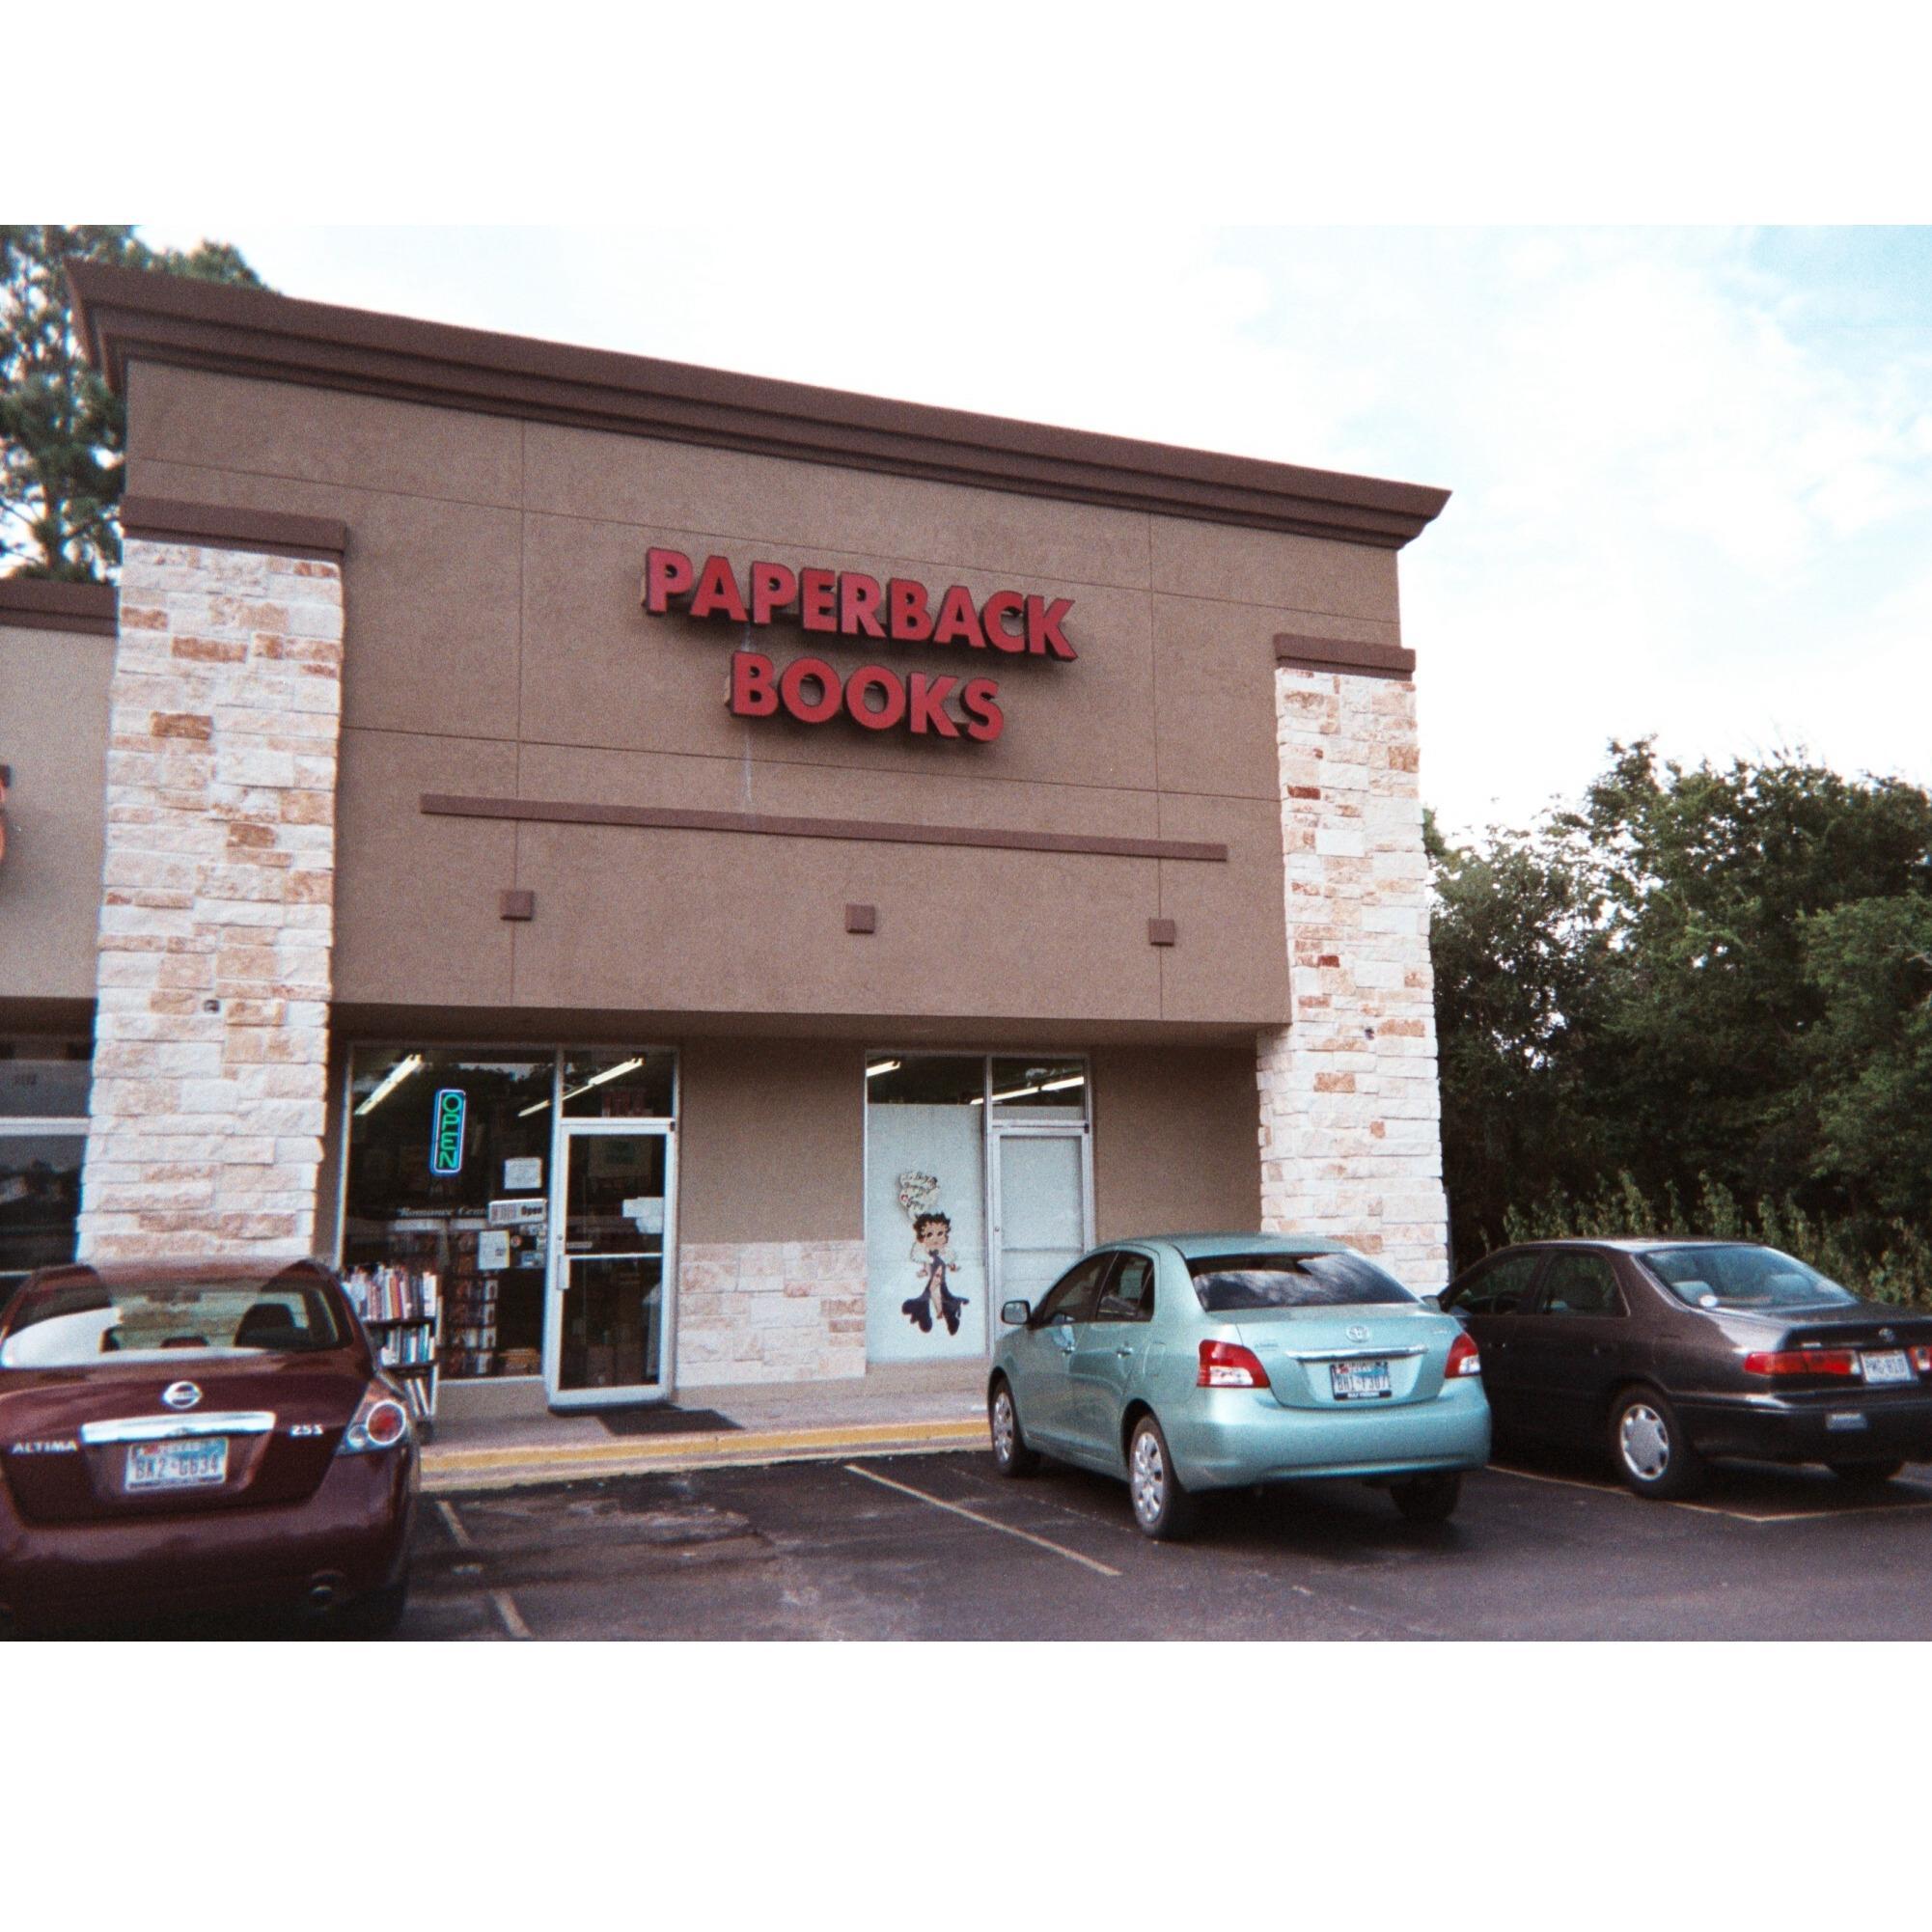 Paperback Swap N Shop image 3